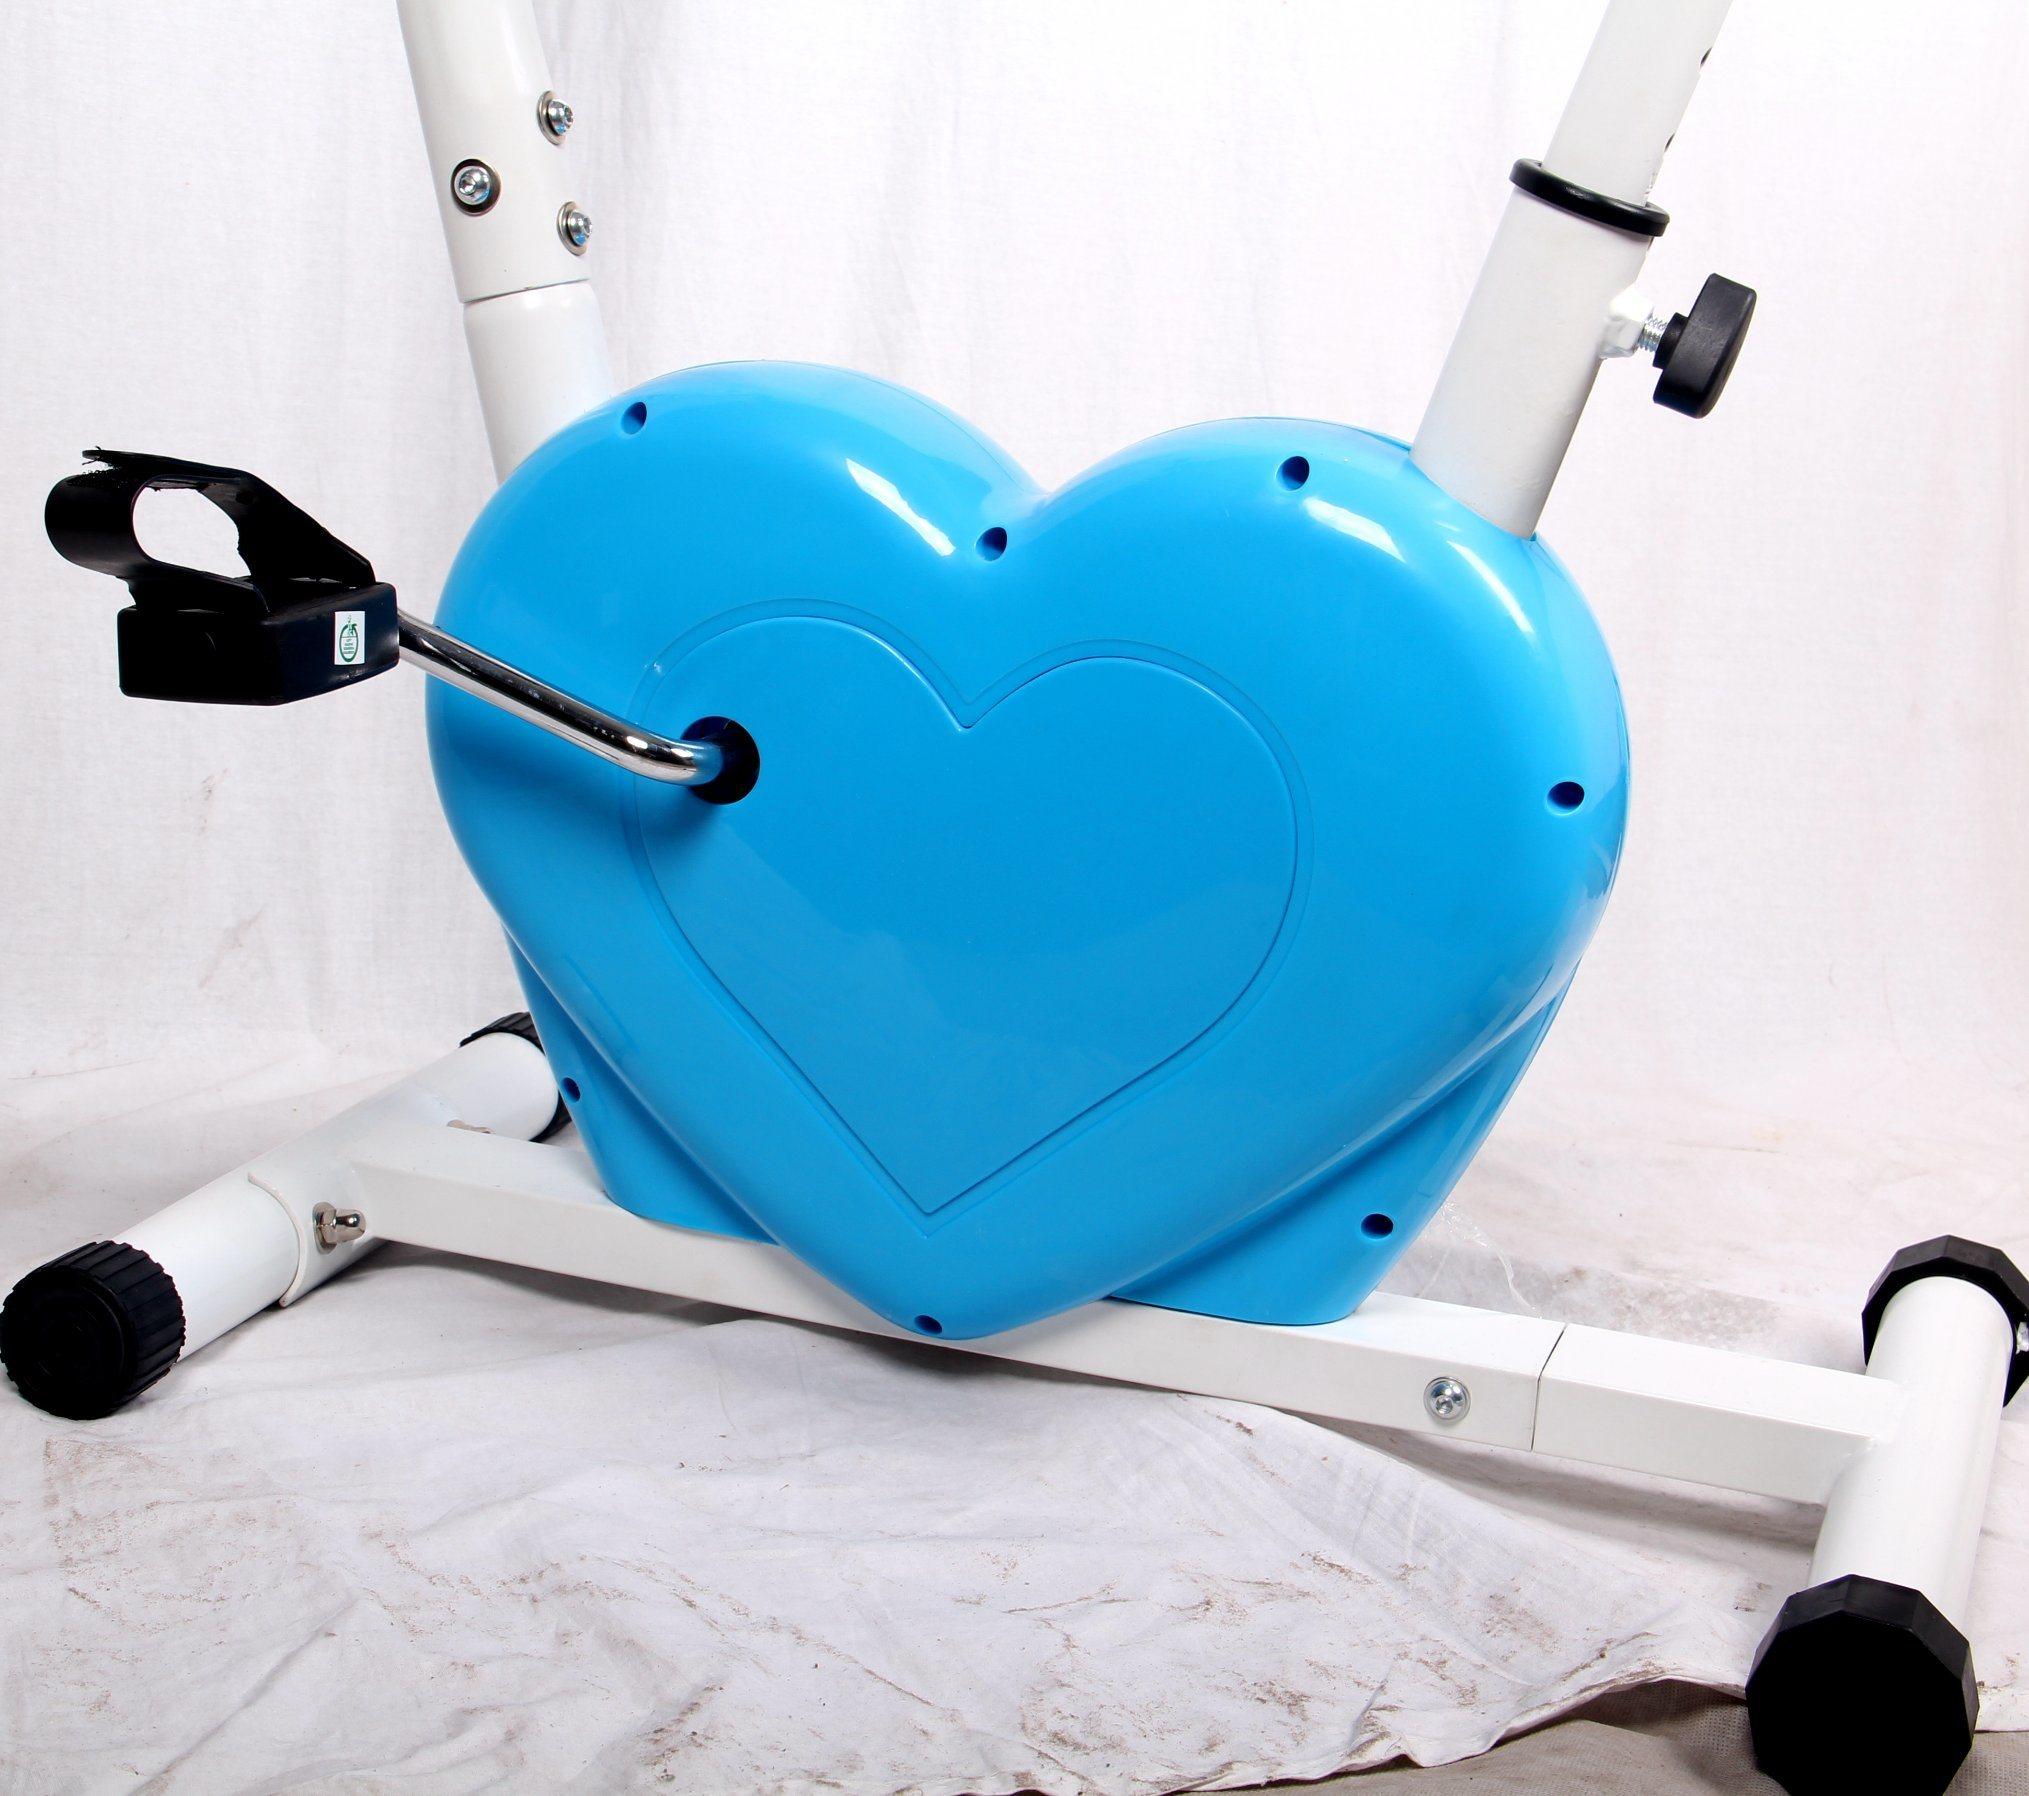 Home Fitness Equipment/Home Exercise Bike